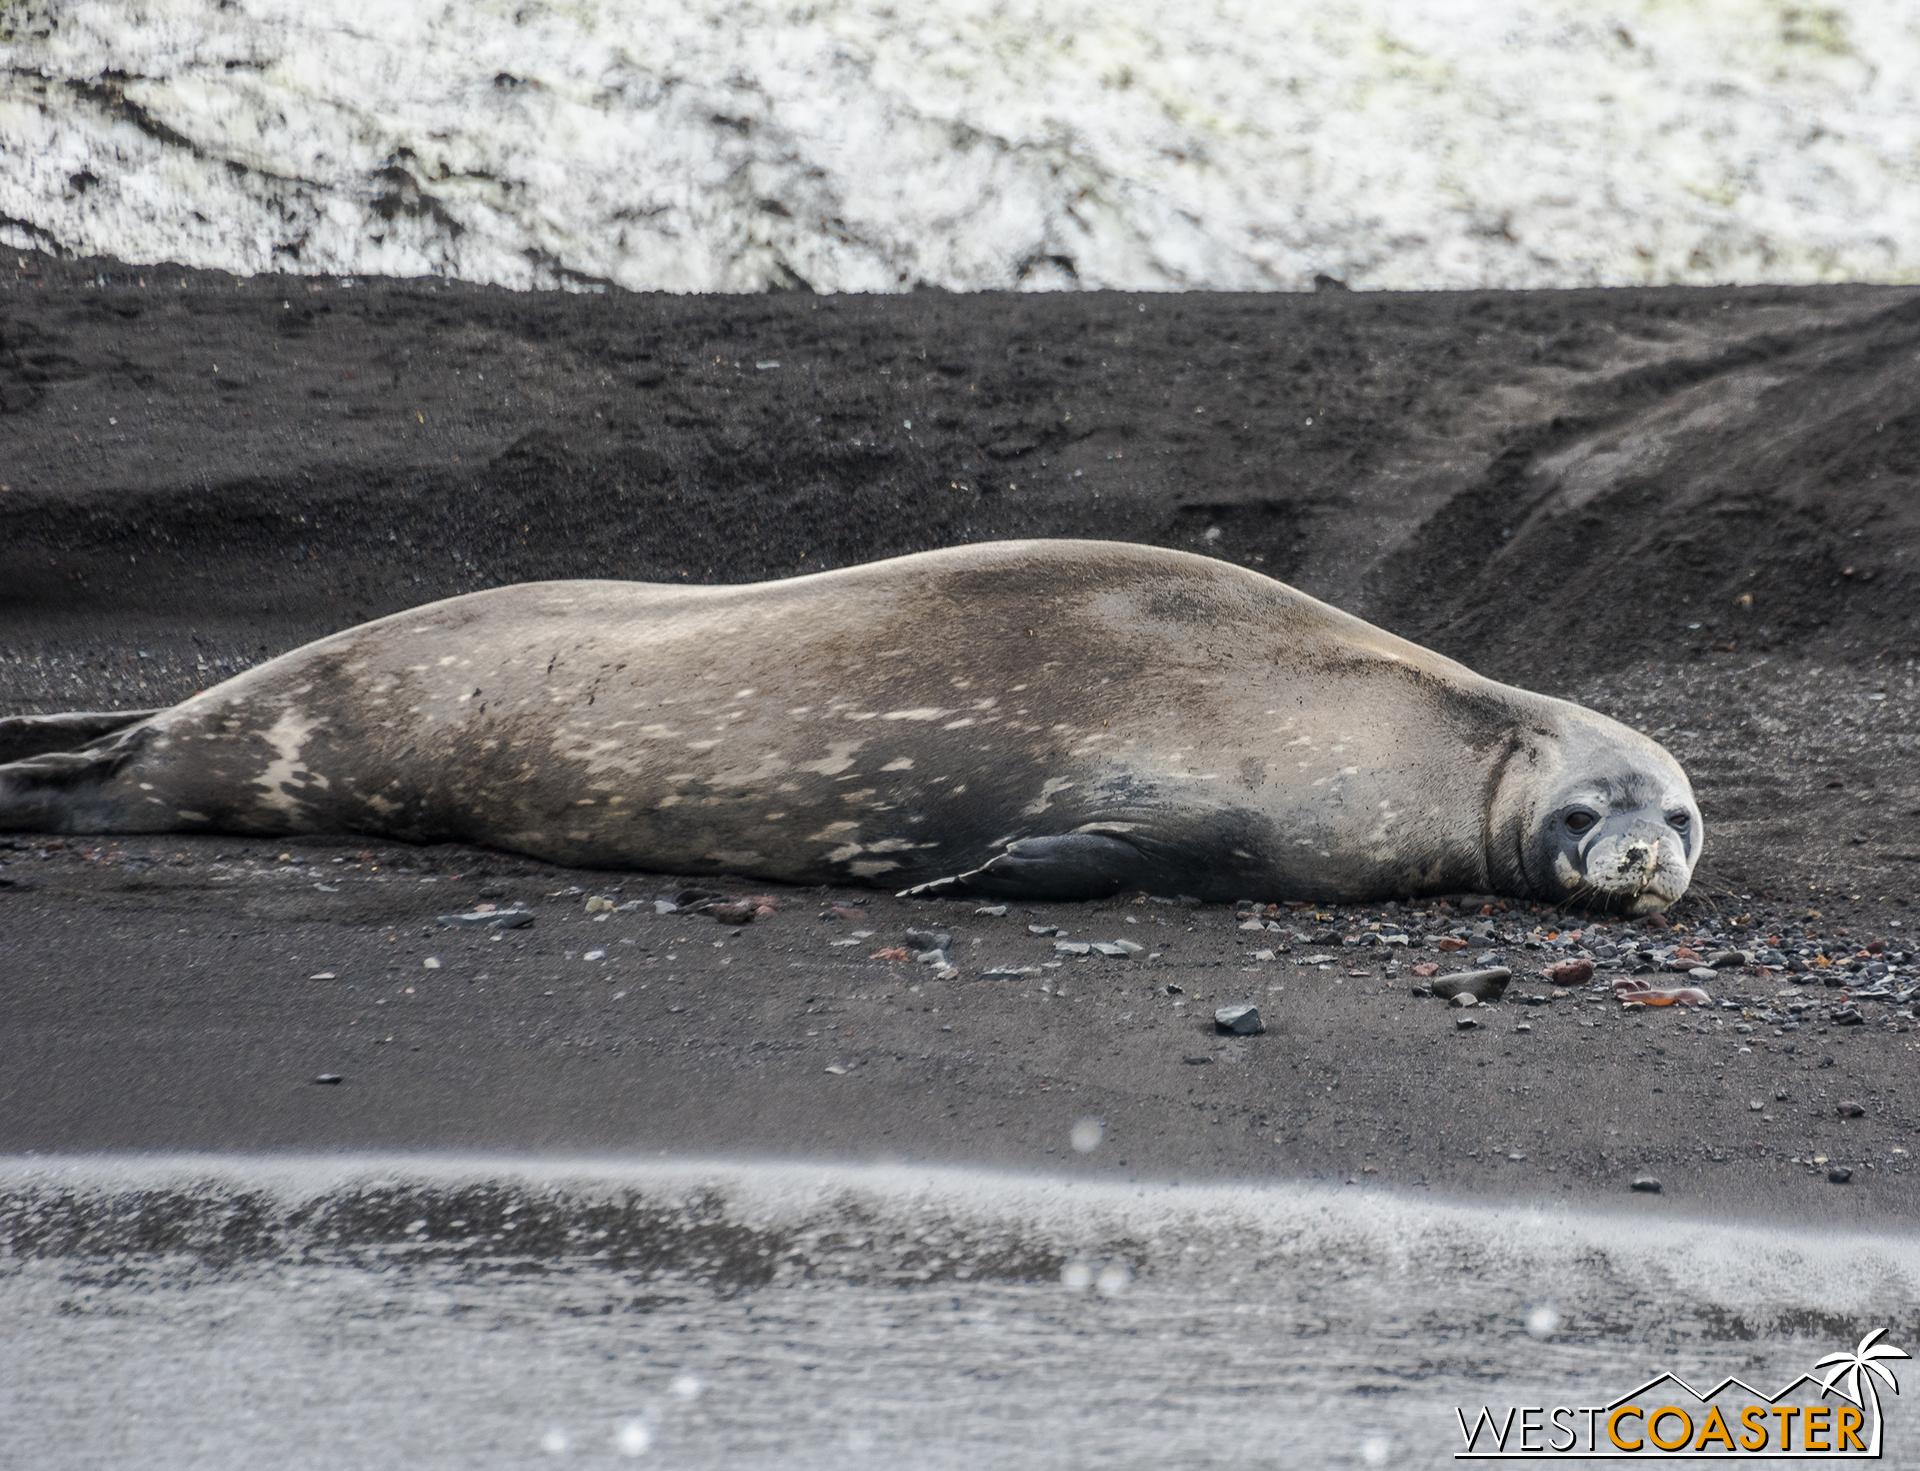 A Weddell seal lies along the warm sand.